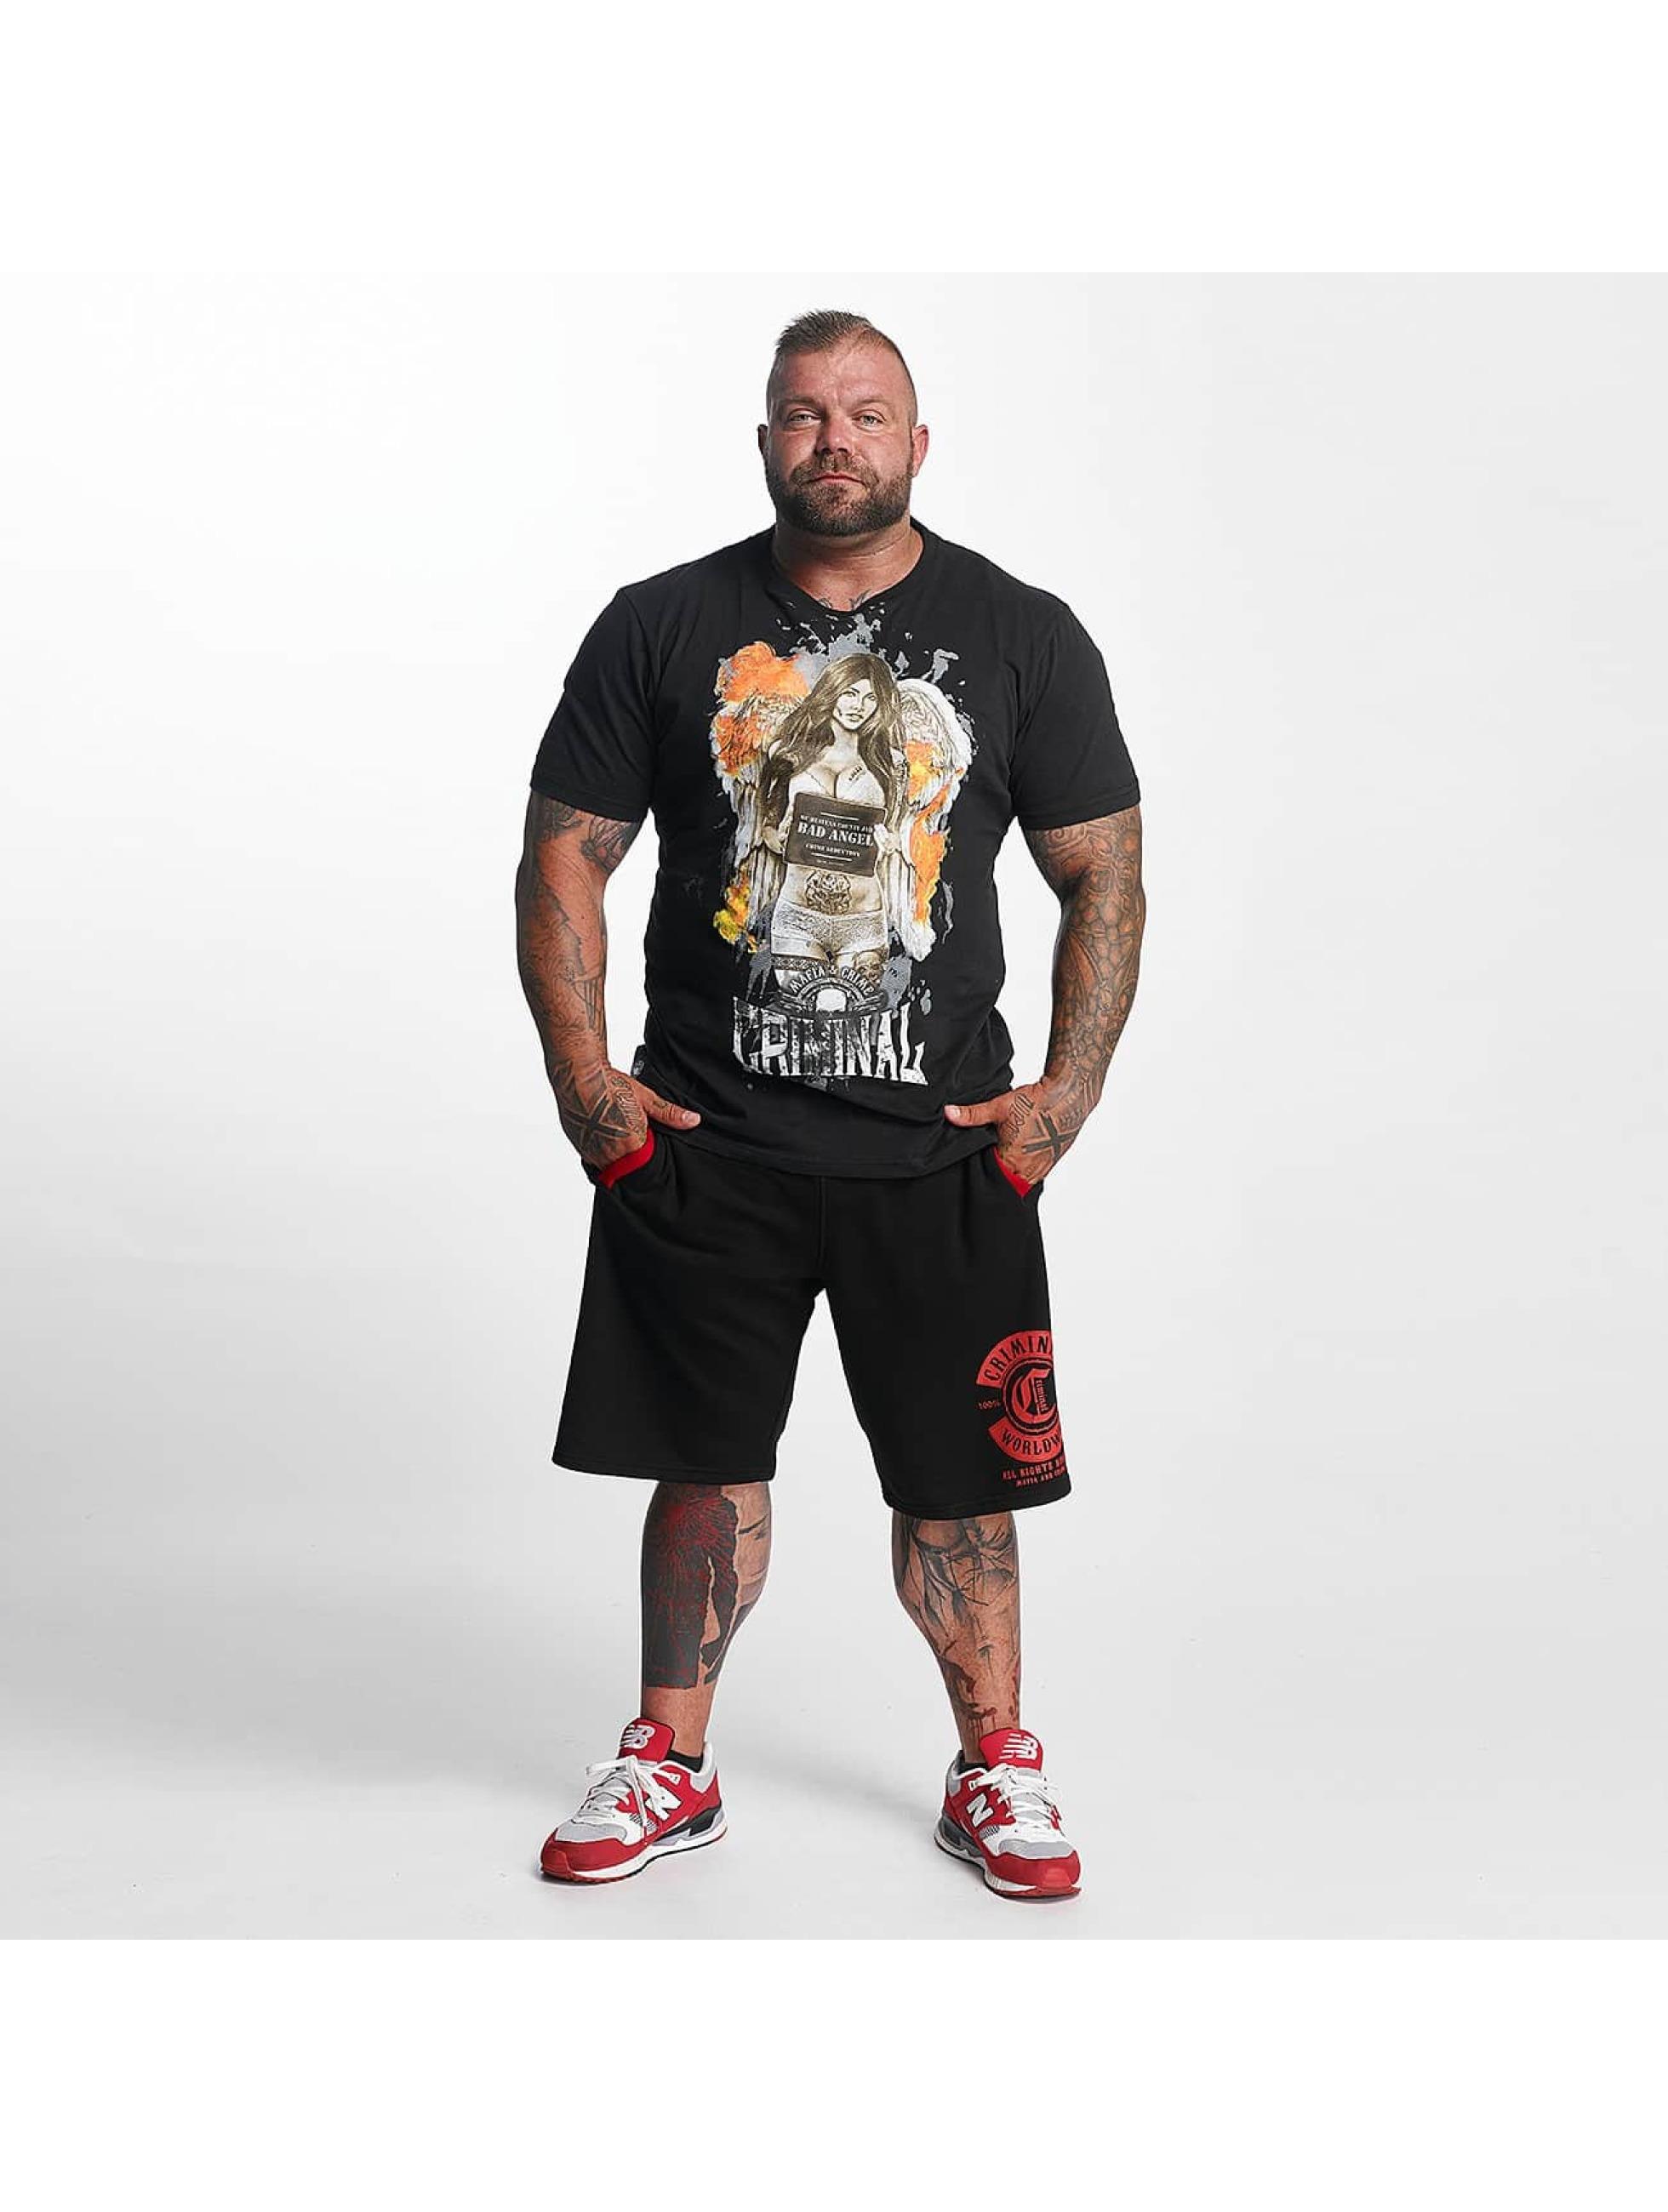 Mafia & Crime T-Shirt Bad Angel Crime Seduction black